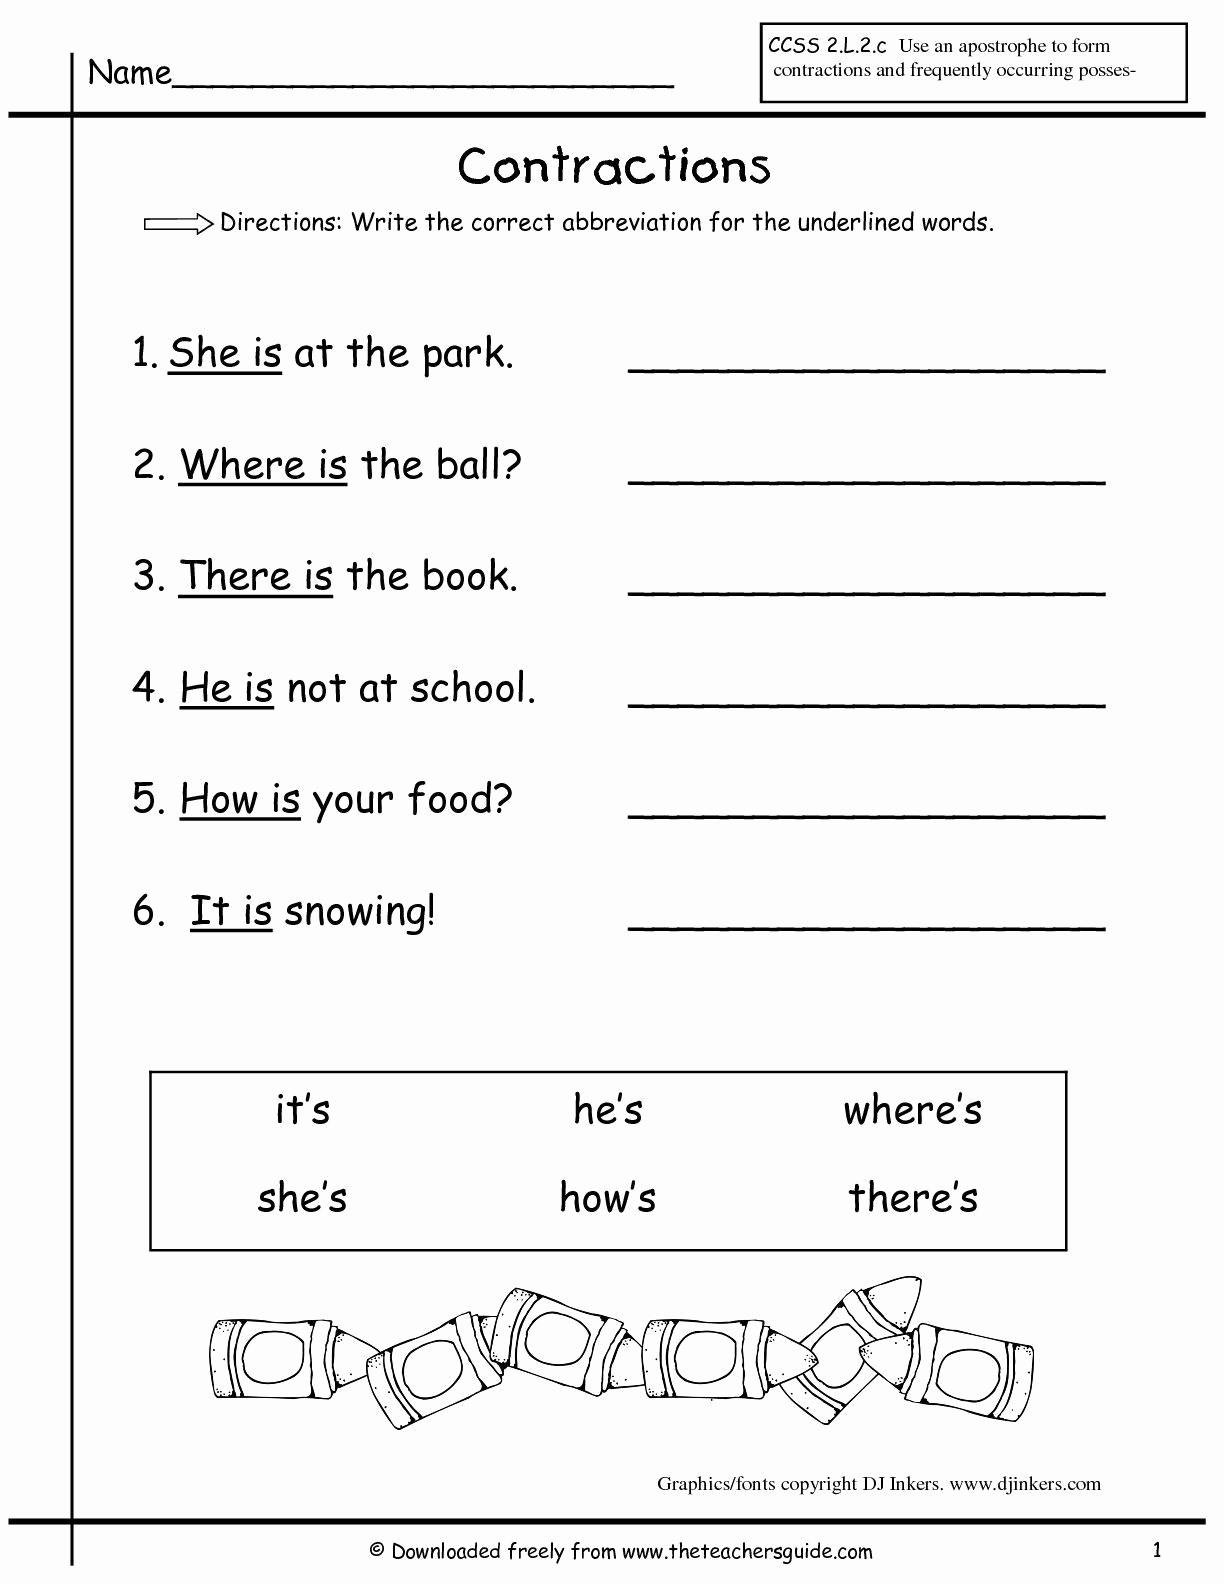 Second Grade Science Worksheets - db-excel.com